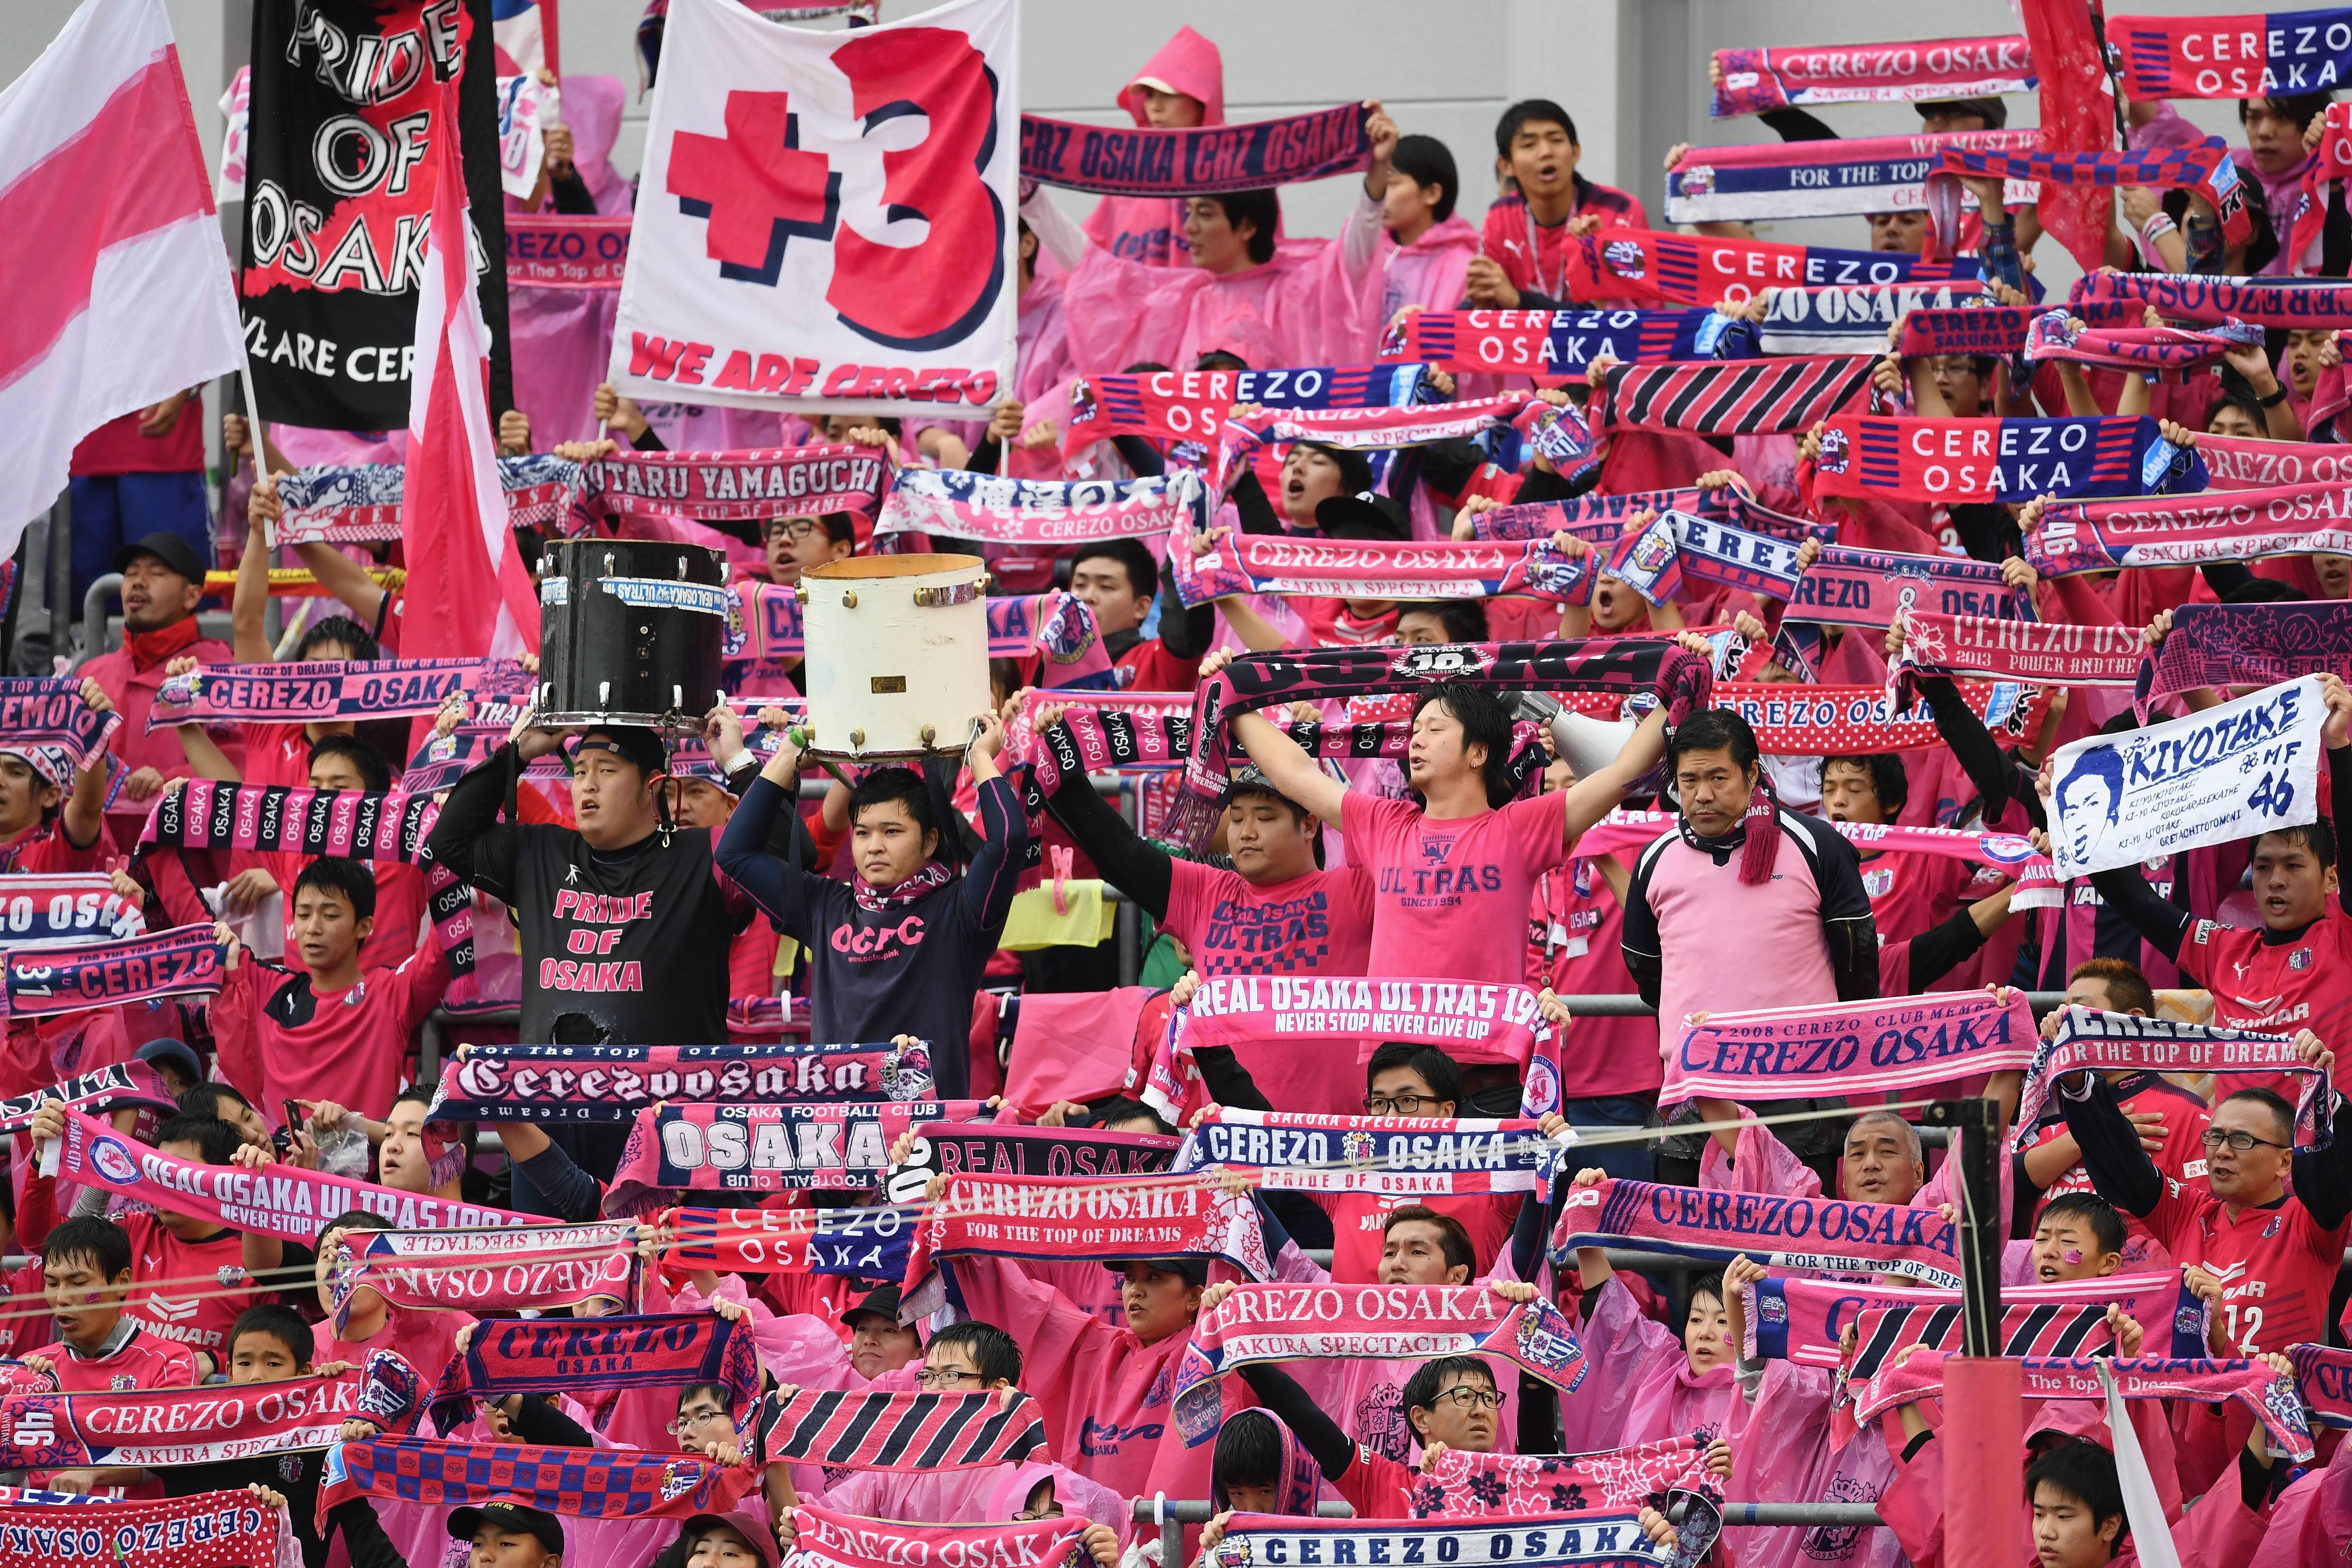 J1 Recap: Cerezo rise to third, Sanfrecce remain unbeaten